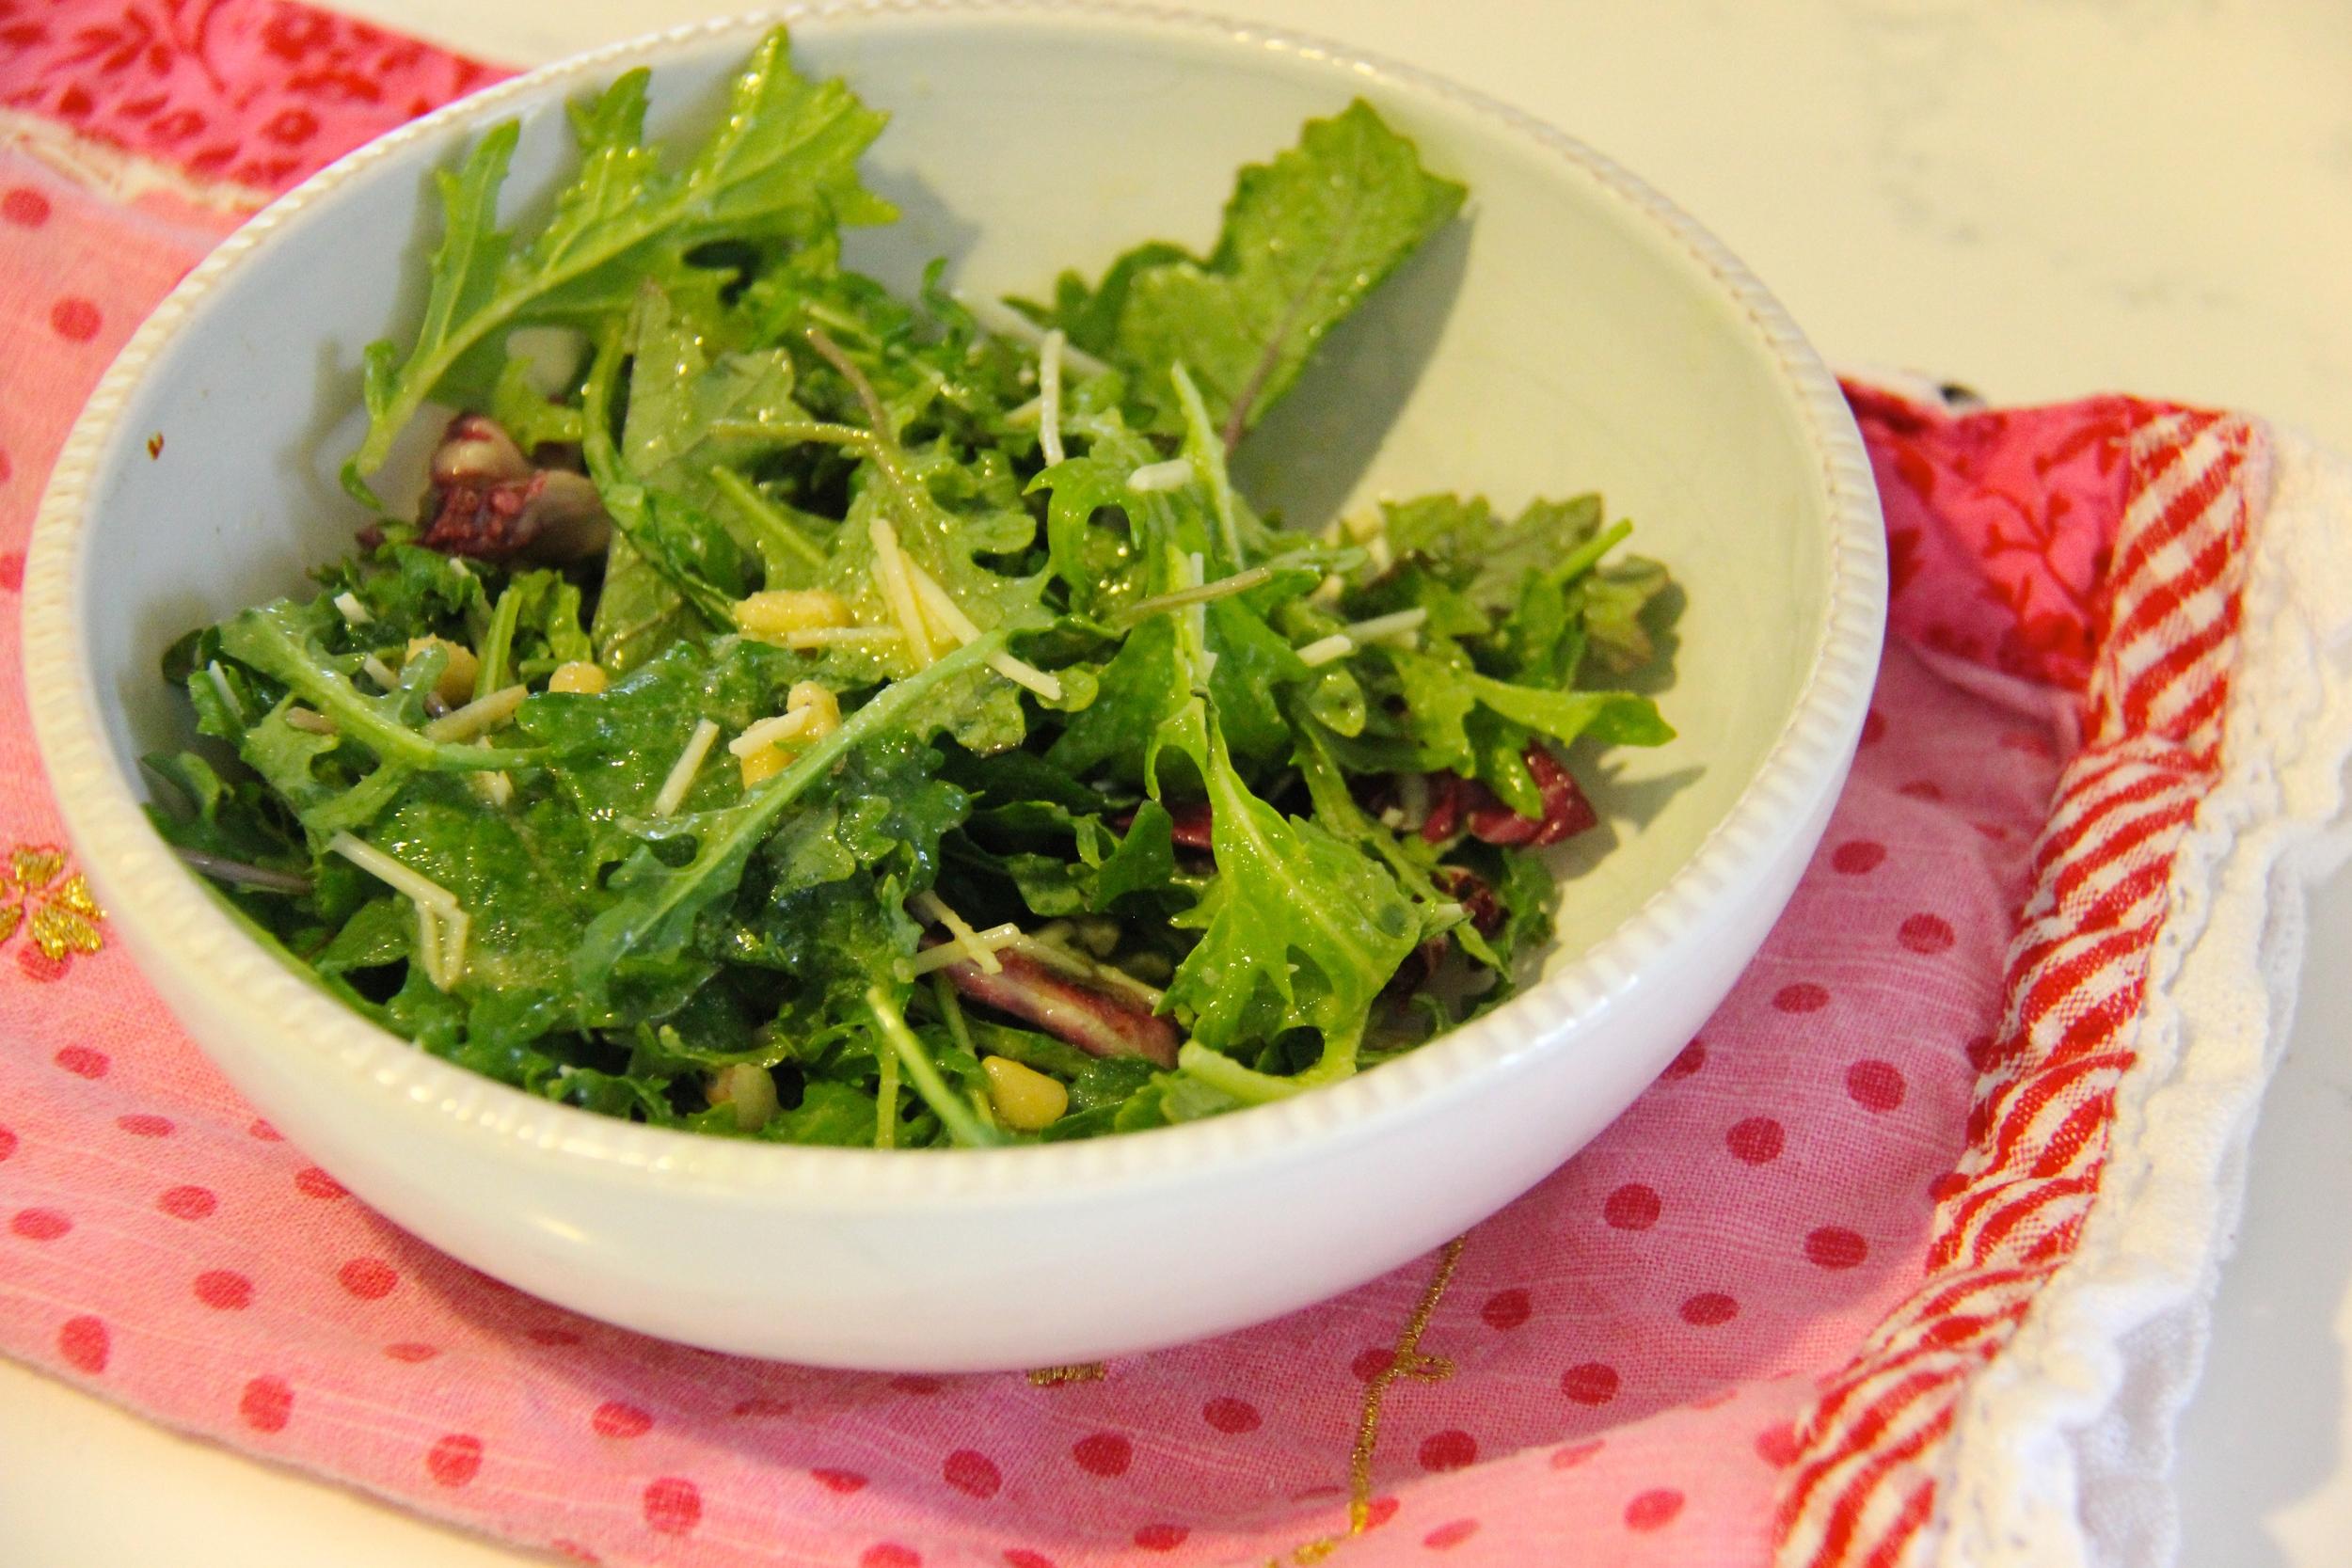 Meg's Favorite Kale Salad